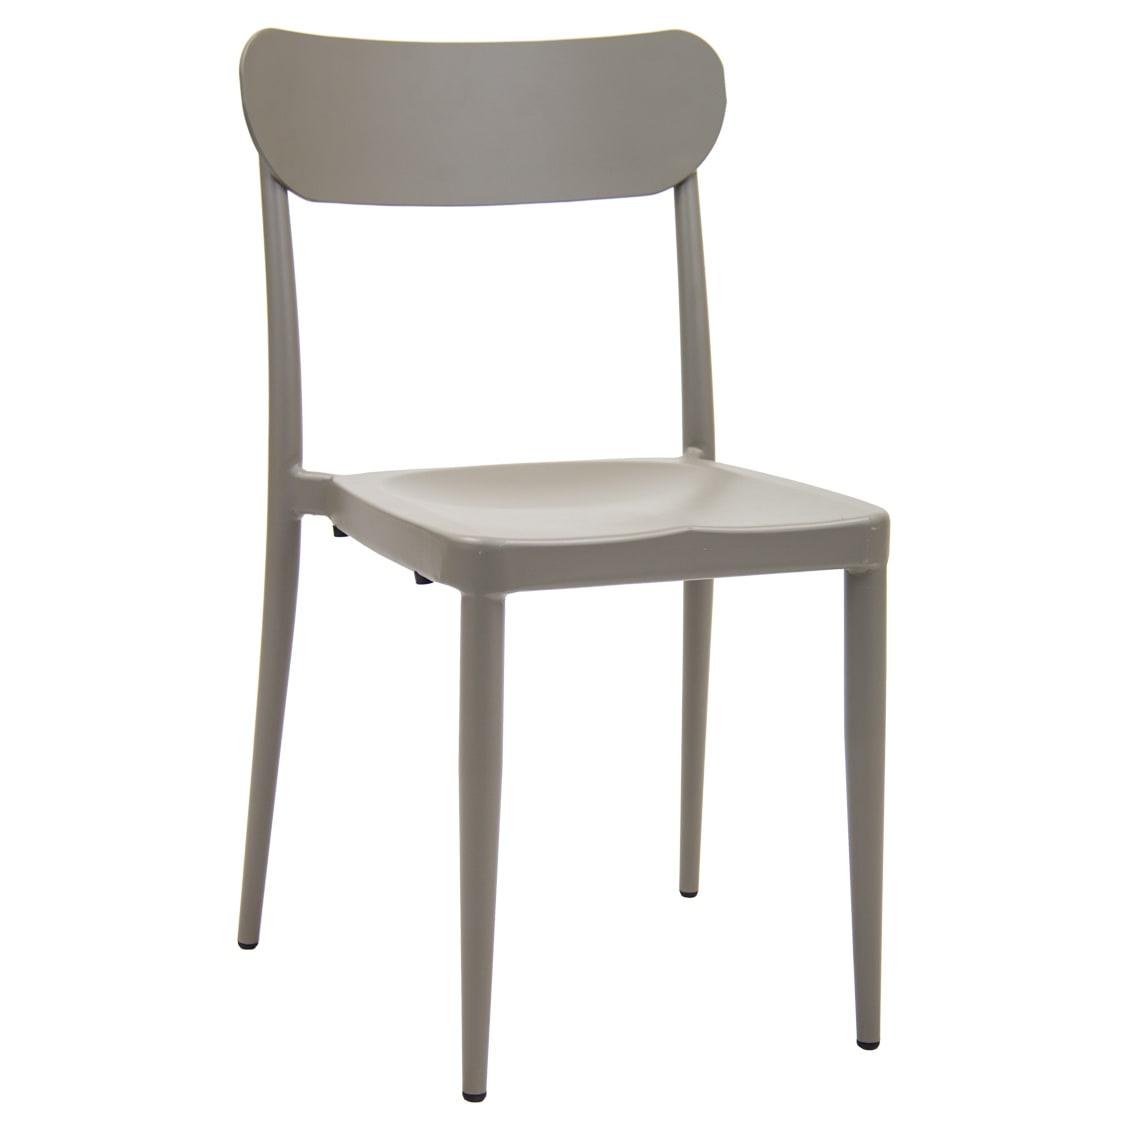 Modern Style Gray Aluminum Patio Chair